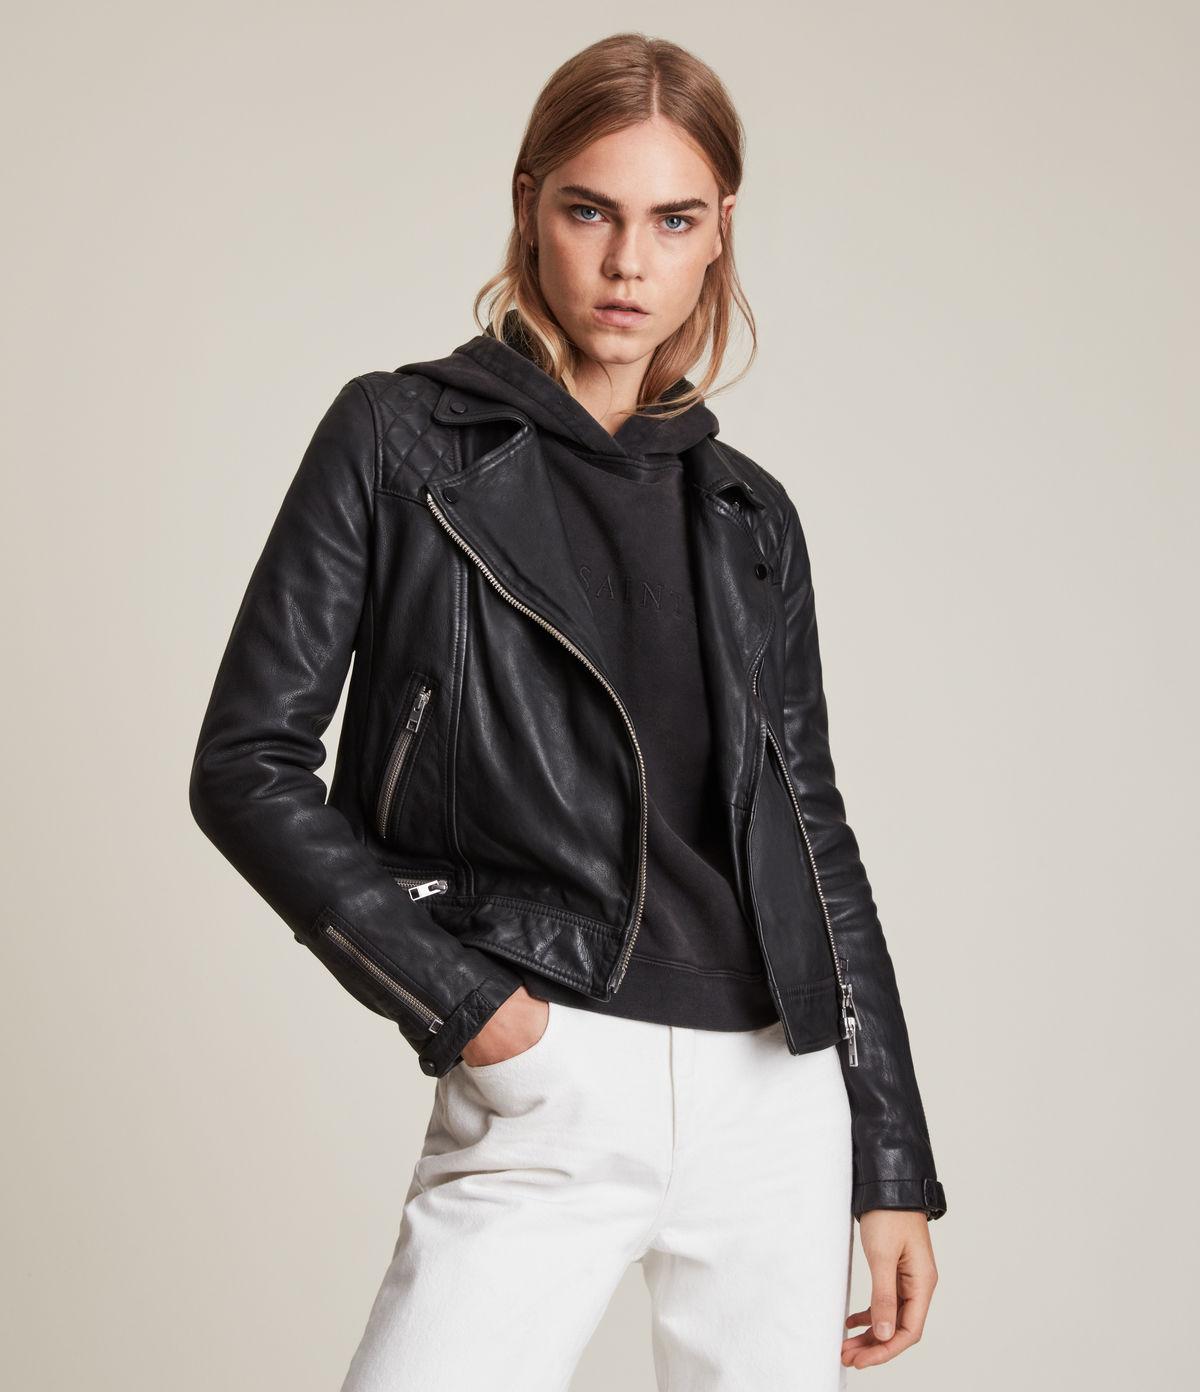 conroy-leather-biker-jacket